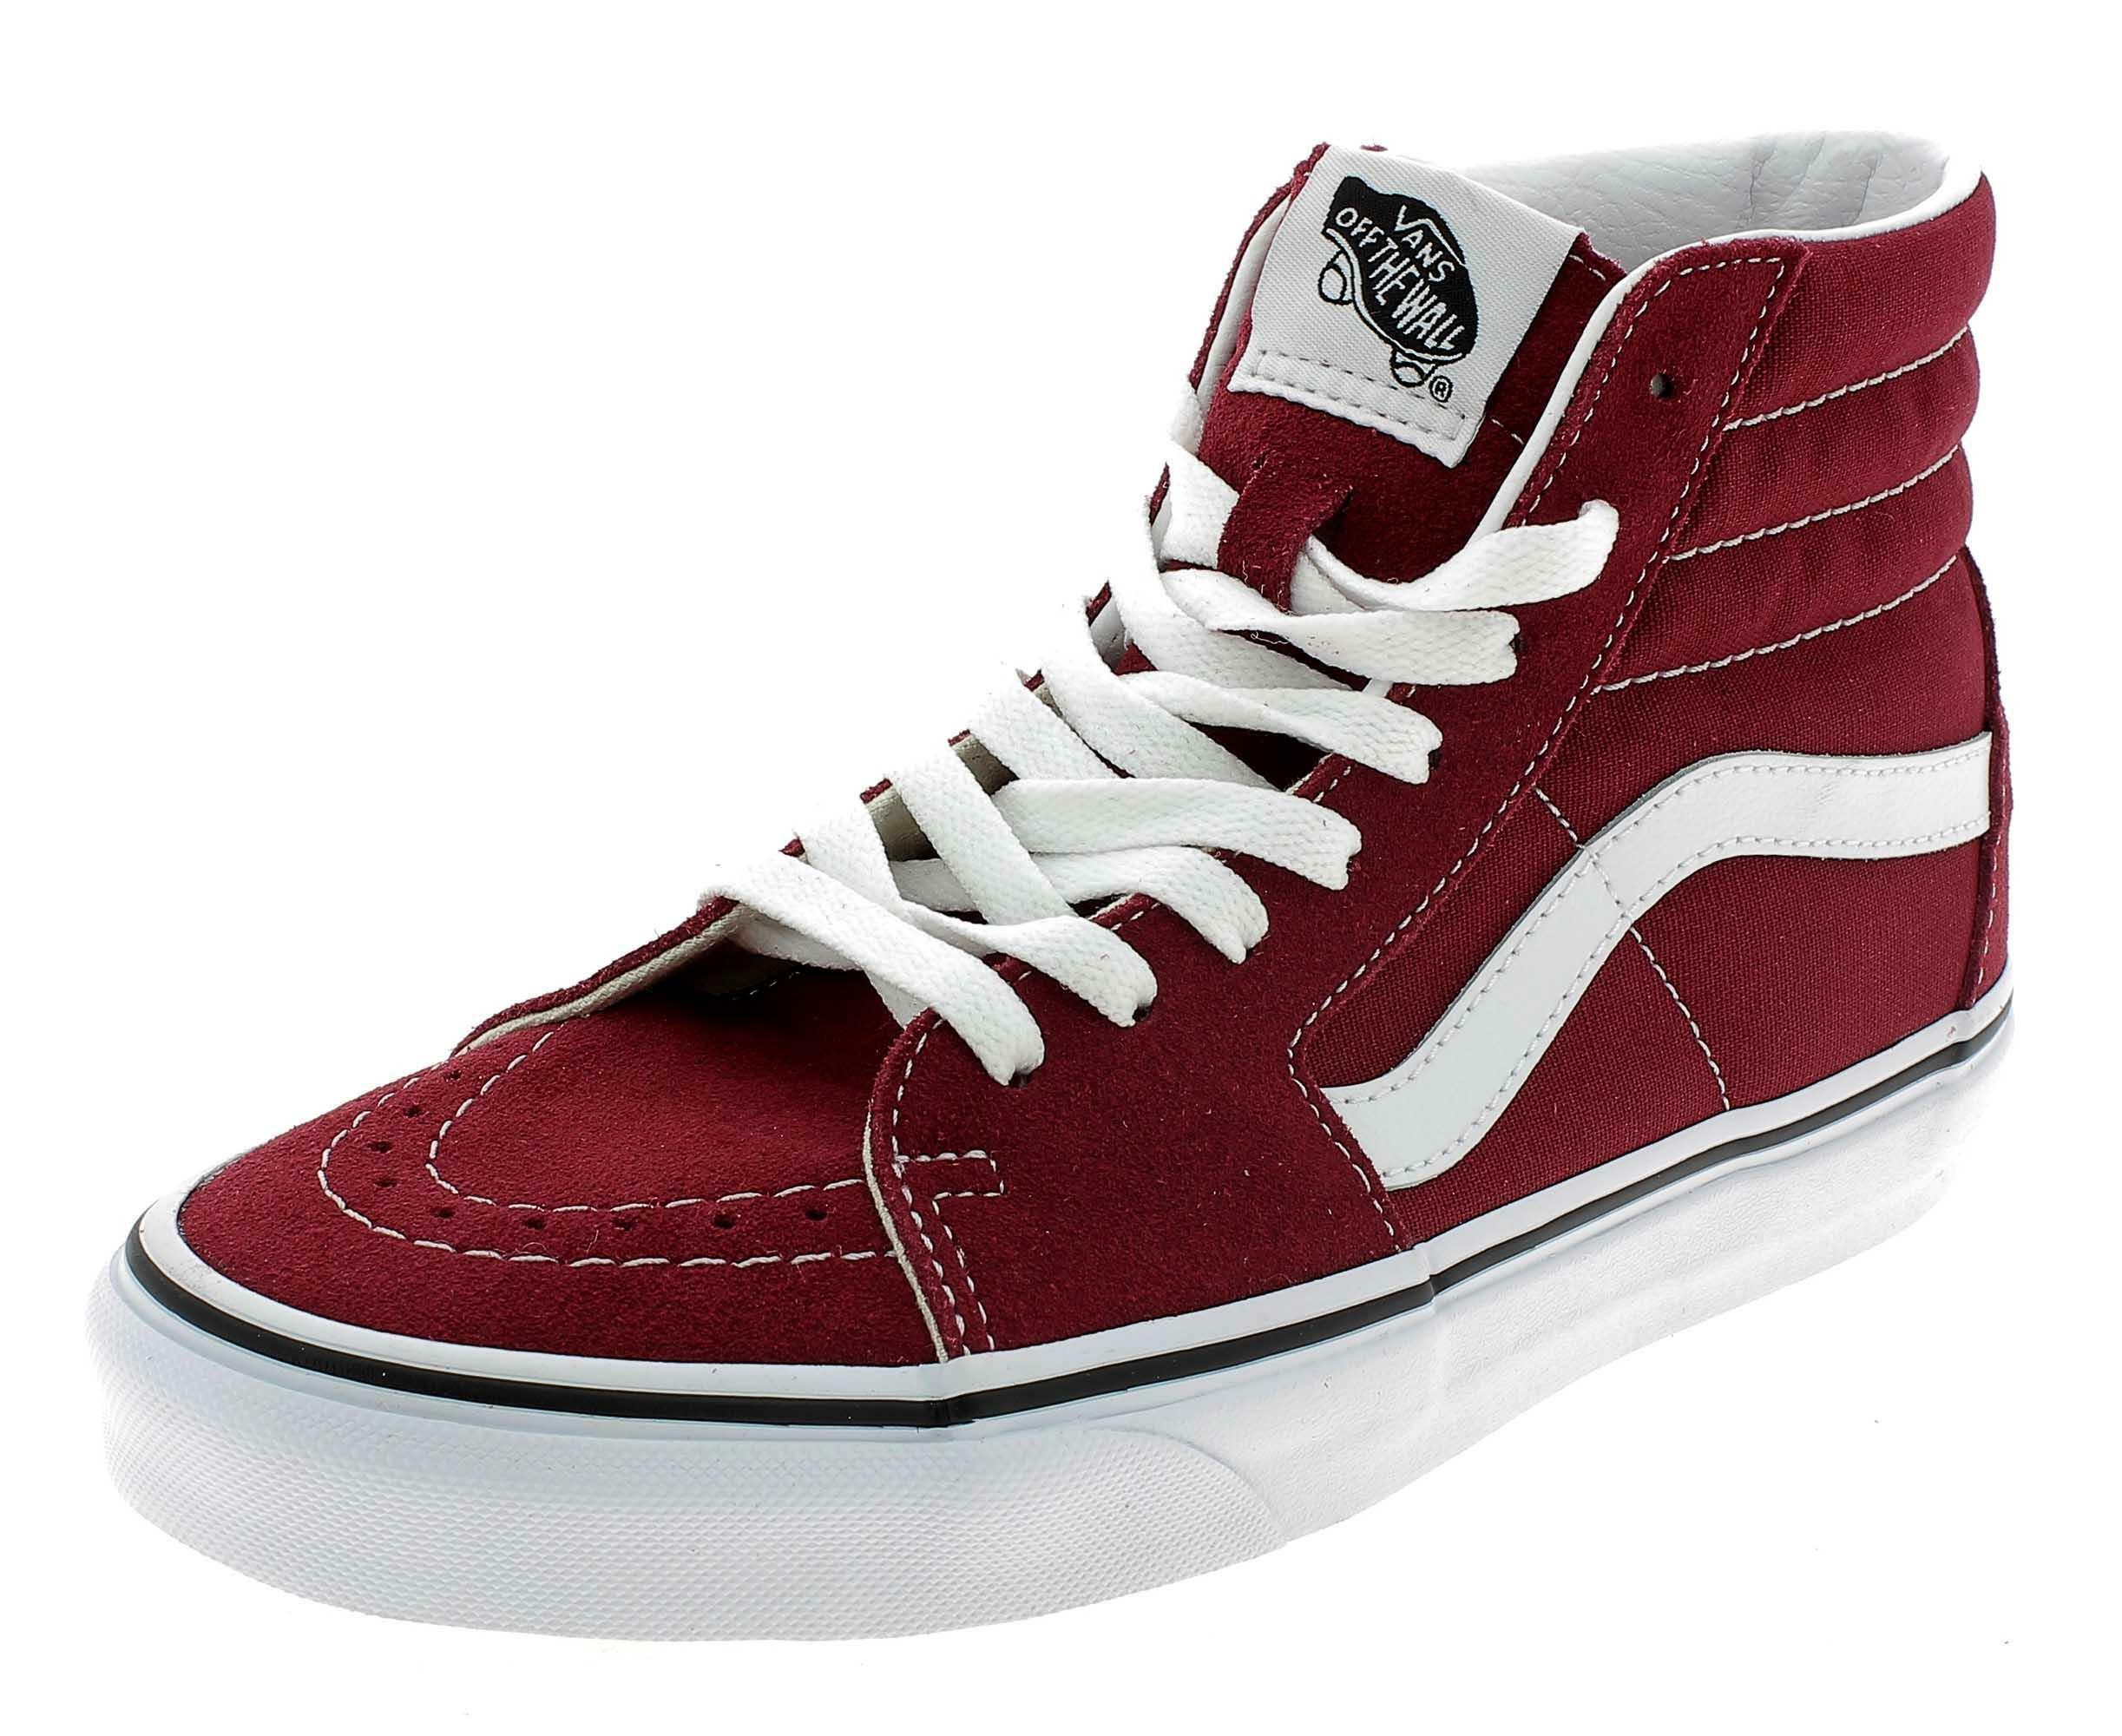 vans sk8-hi old skool alte scarpe sportive bordeaux vn0a38gevg41